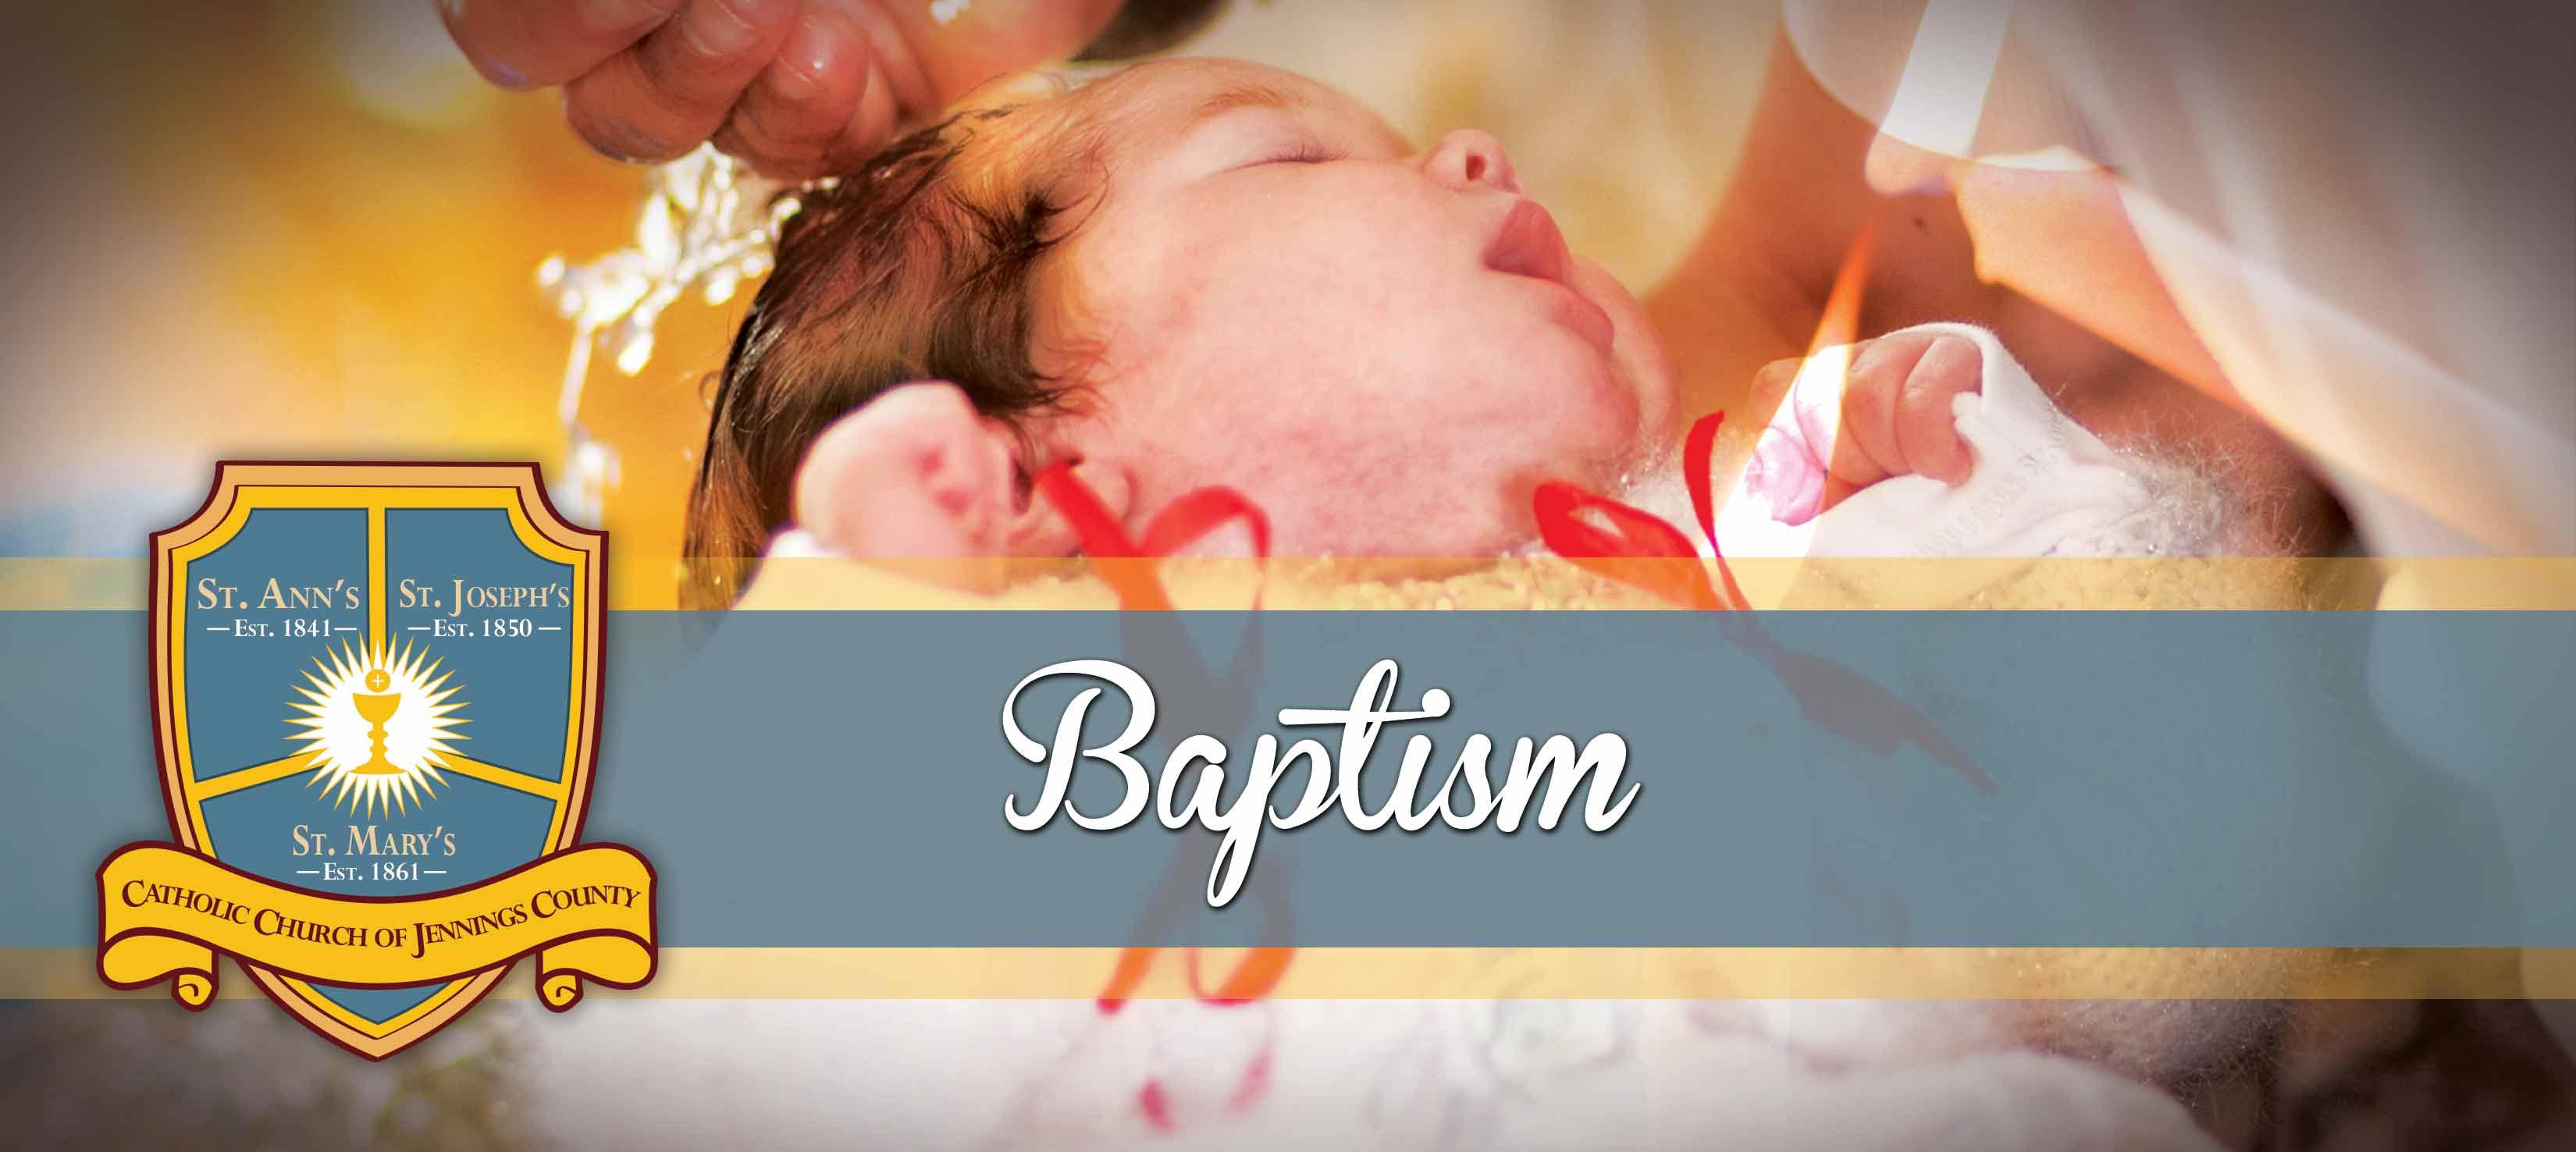 Baptism - CCJC